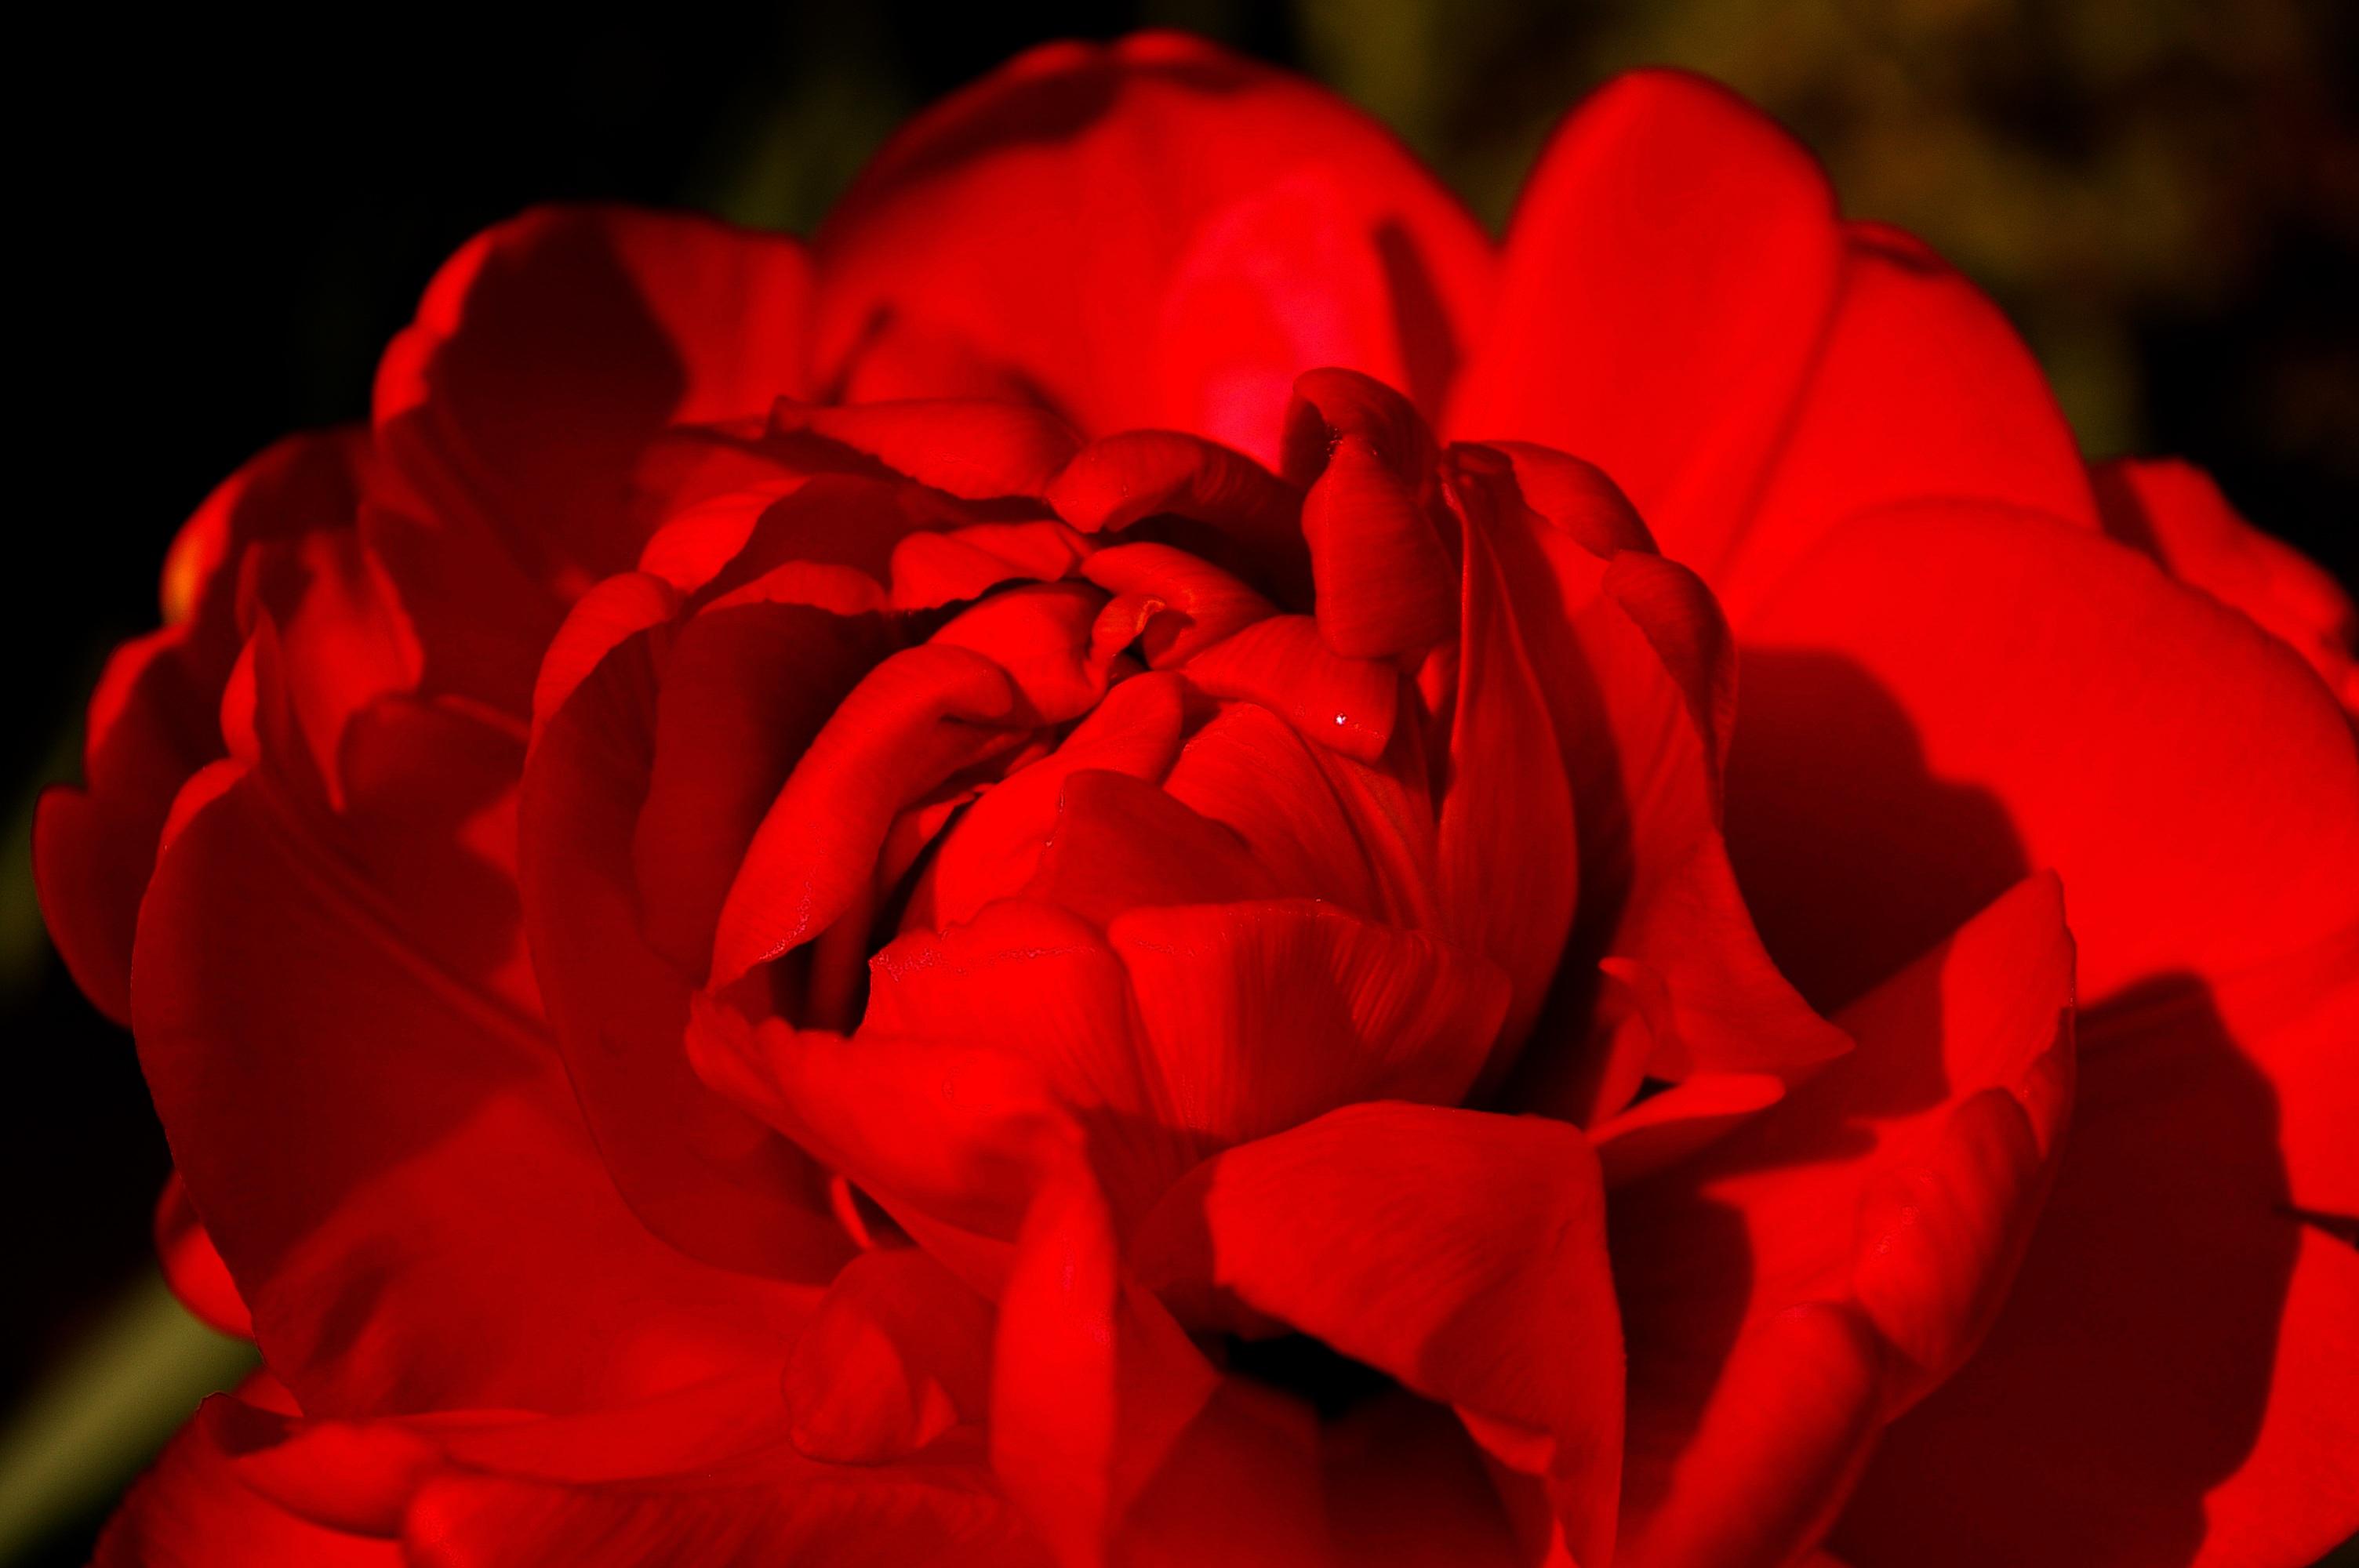 Free images nature open petal color botany colorful pink free images nature open petal color botany colorful pink flora flower bed close up farbenpracht petals bright beautiful exotic flower izmirmasajfo